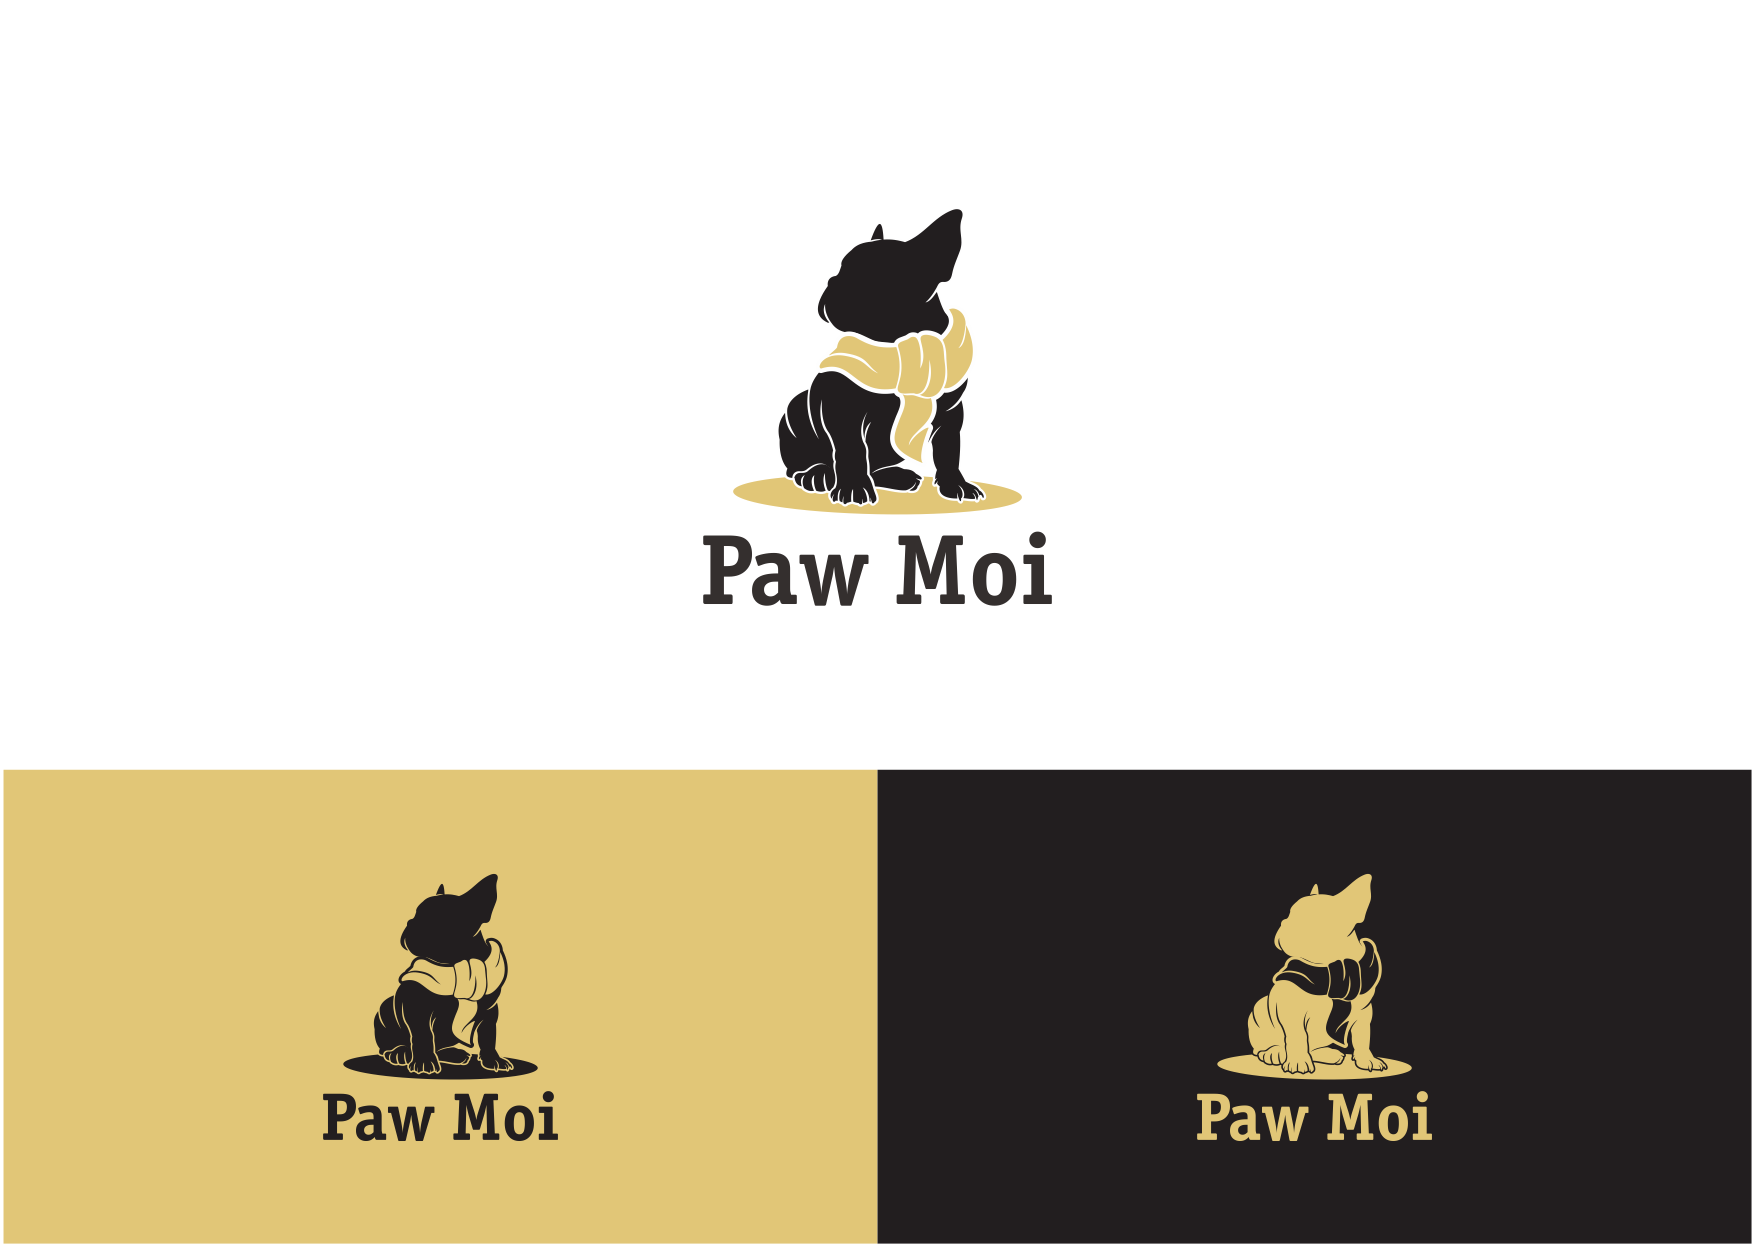 Create a logo for a luxury French Bulldog brand